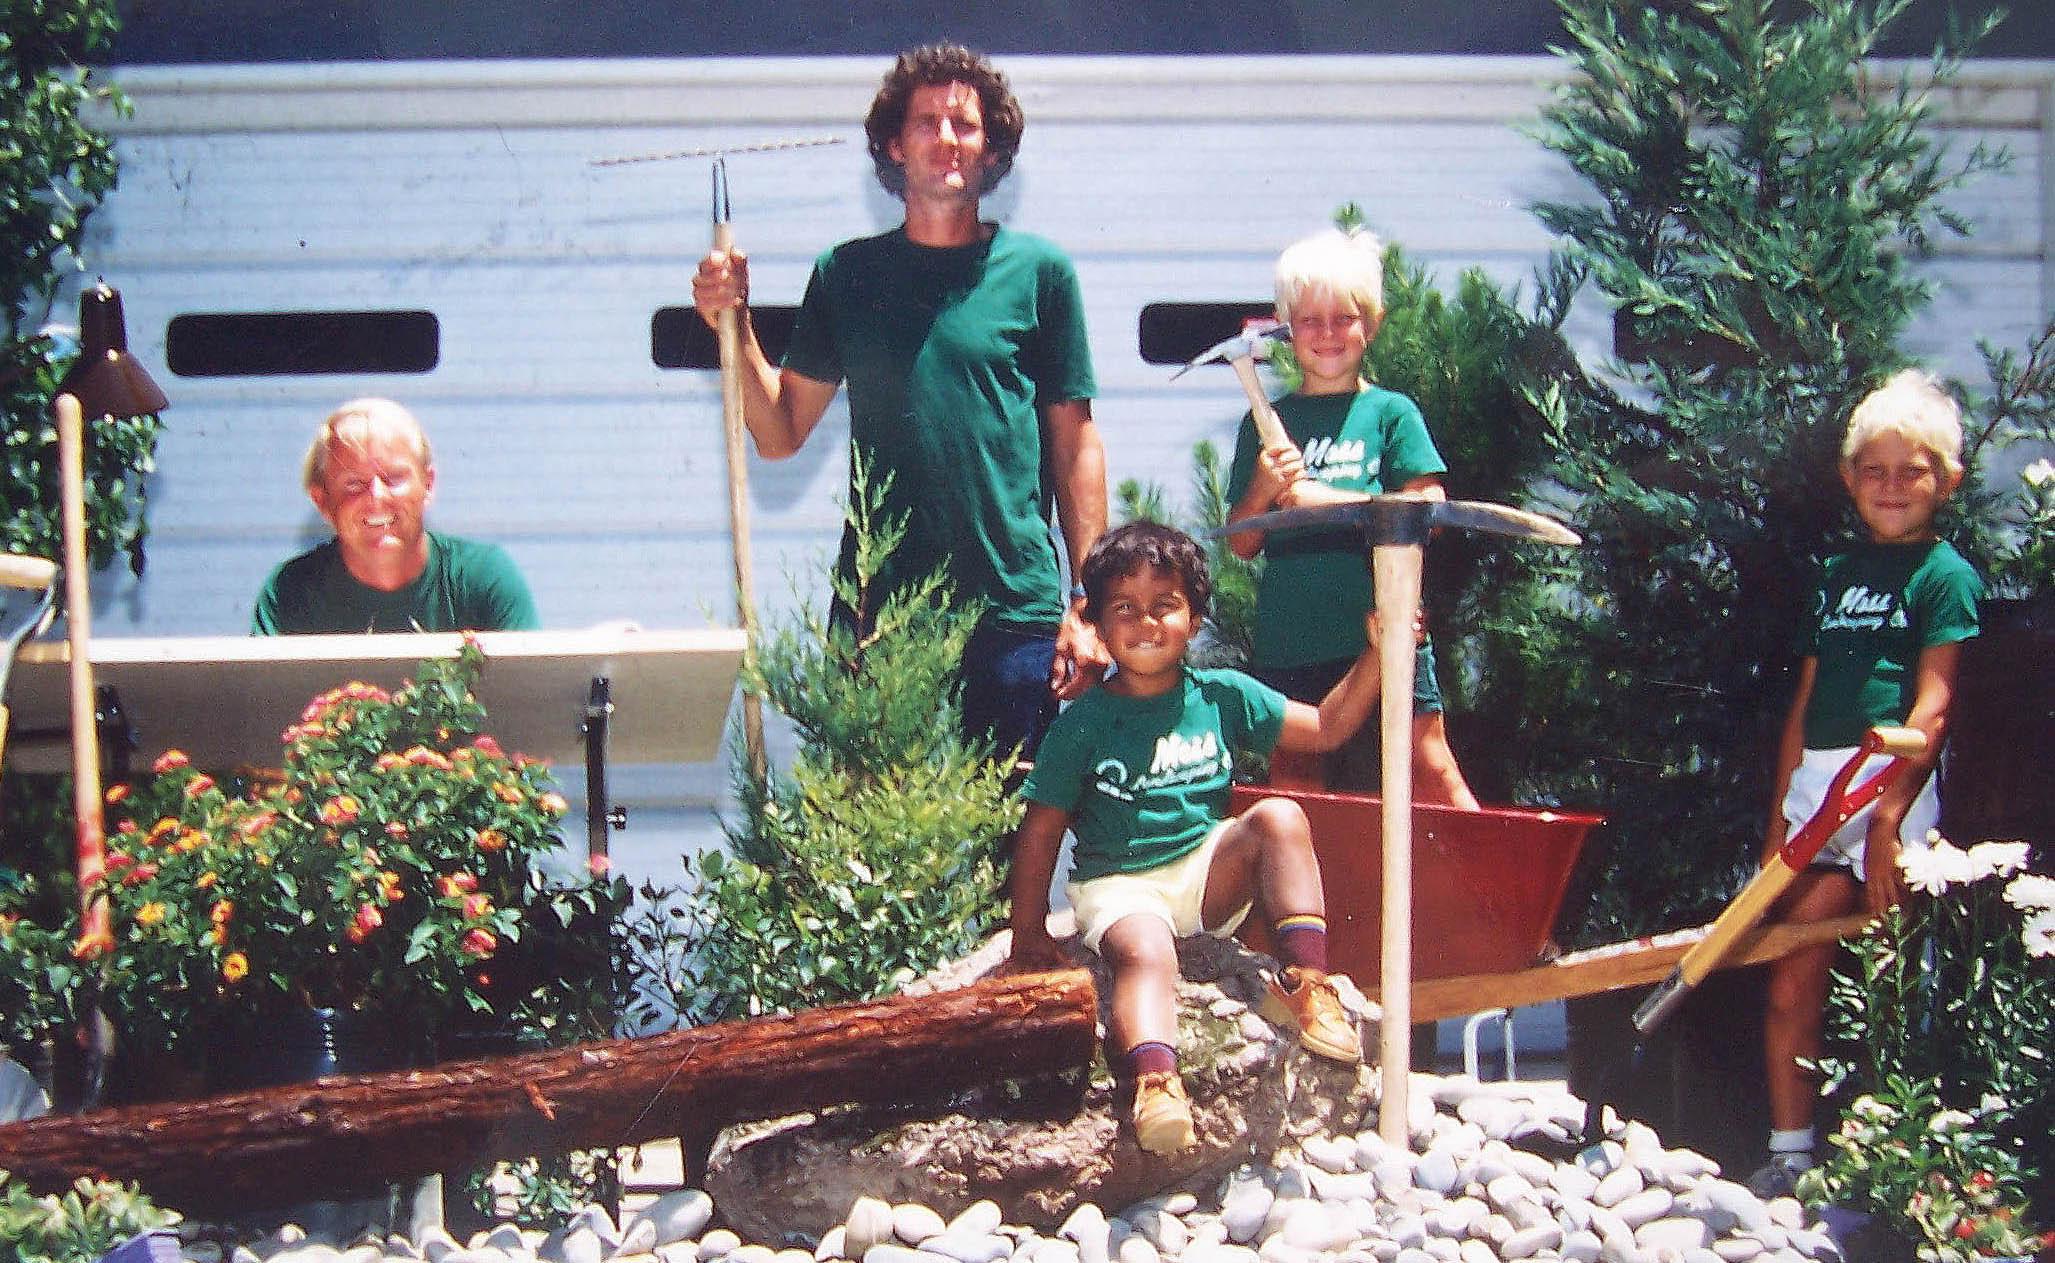 Moss Landscaping Company advertisement, 1977  L to R: Mike Moss, Glen Selman, Ryan Moss, Jake and Joel Moss